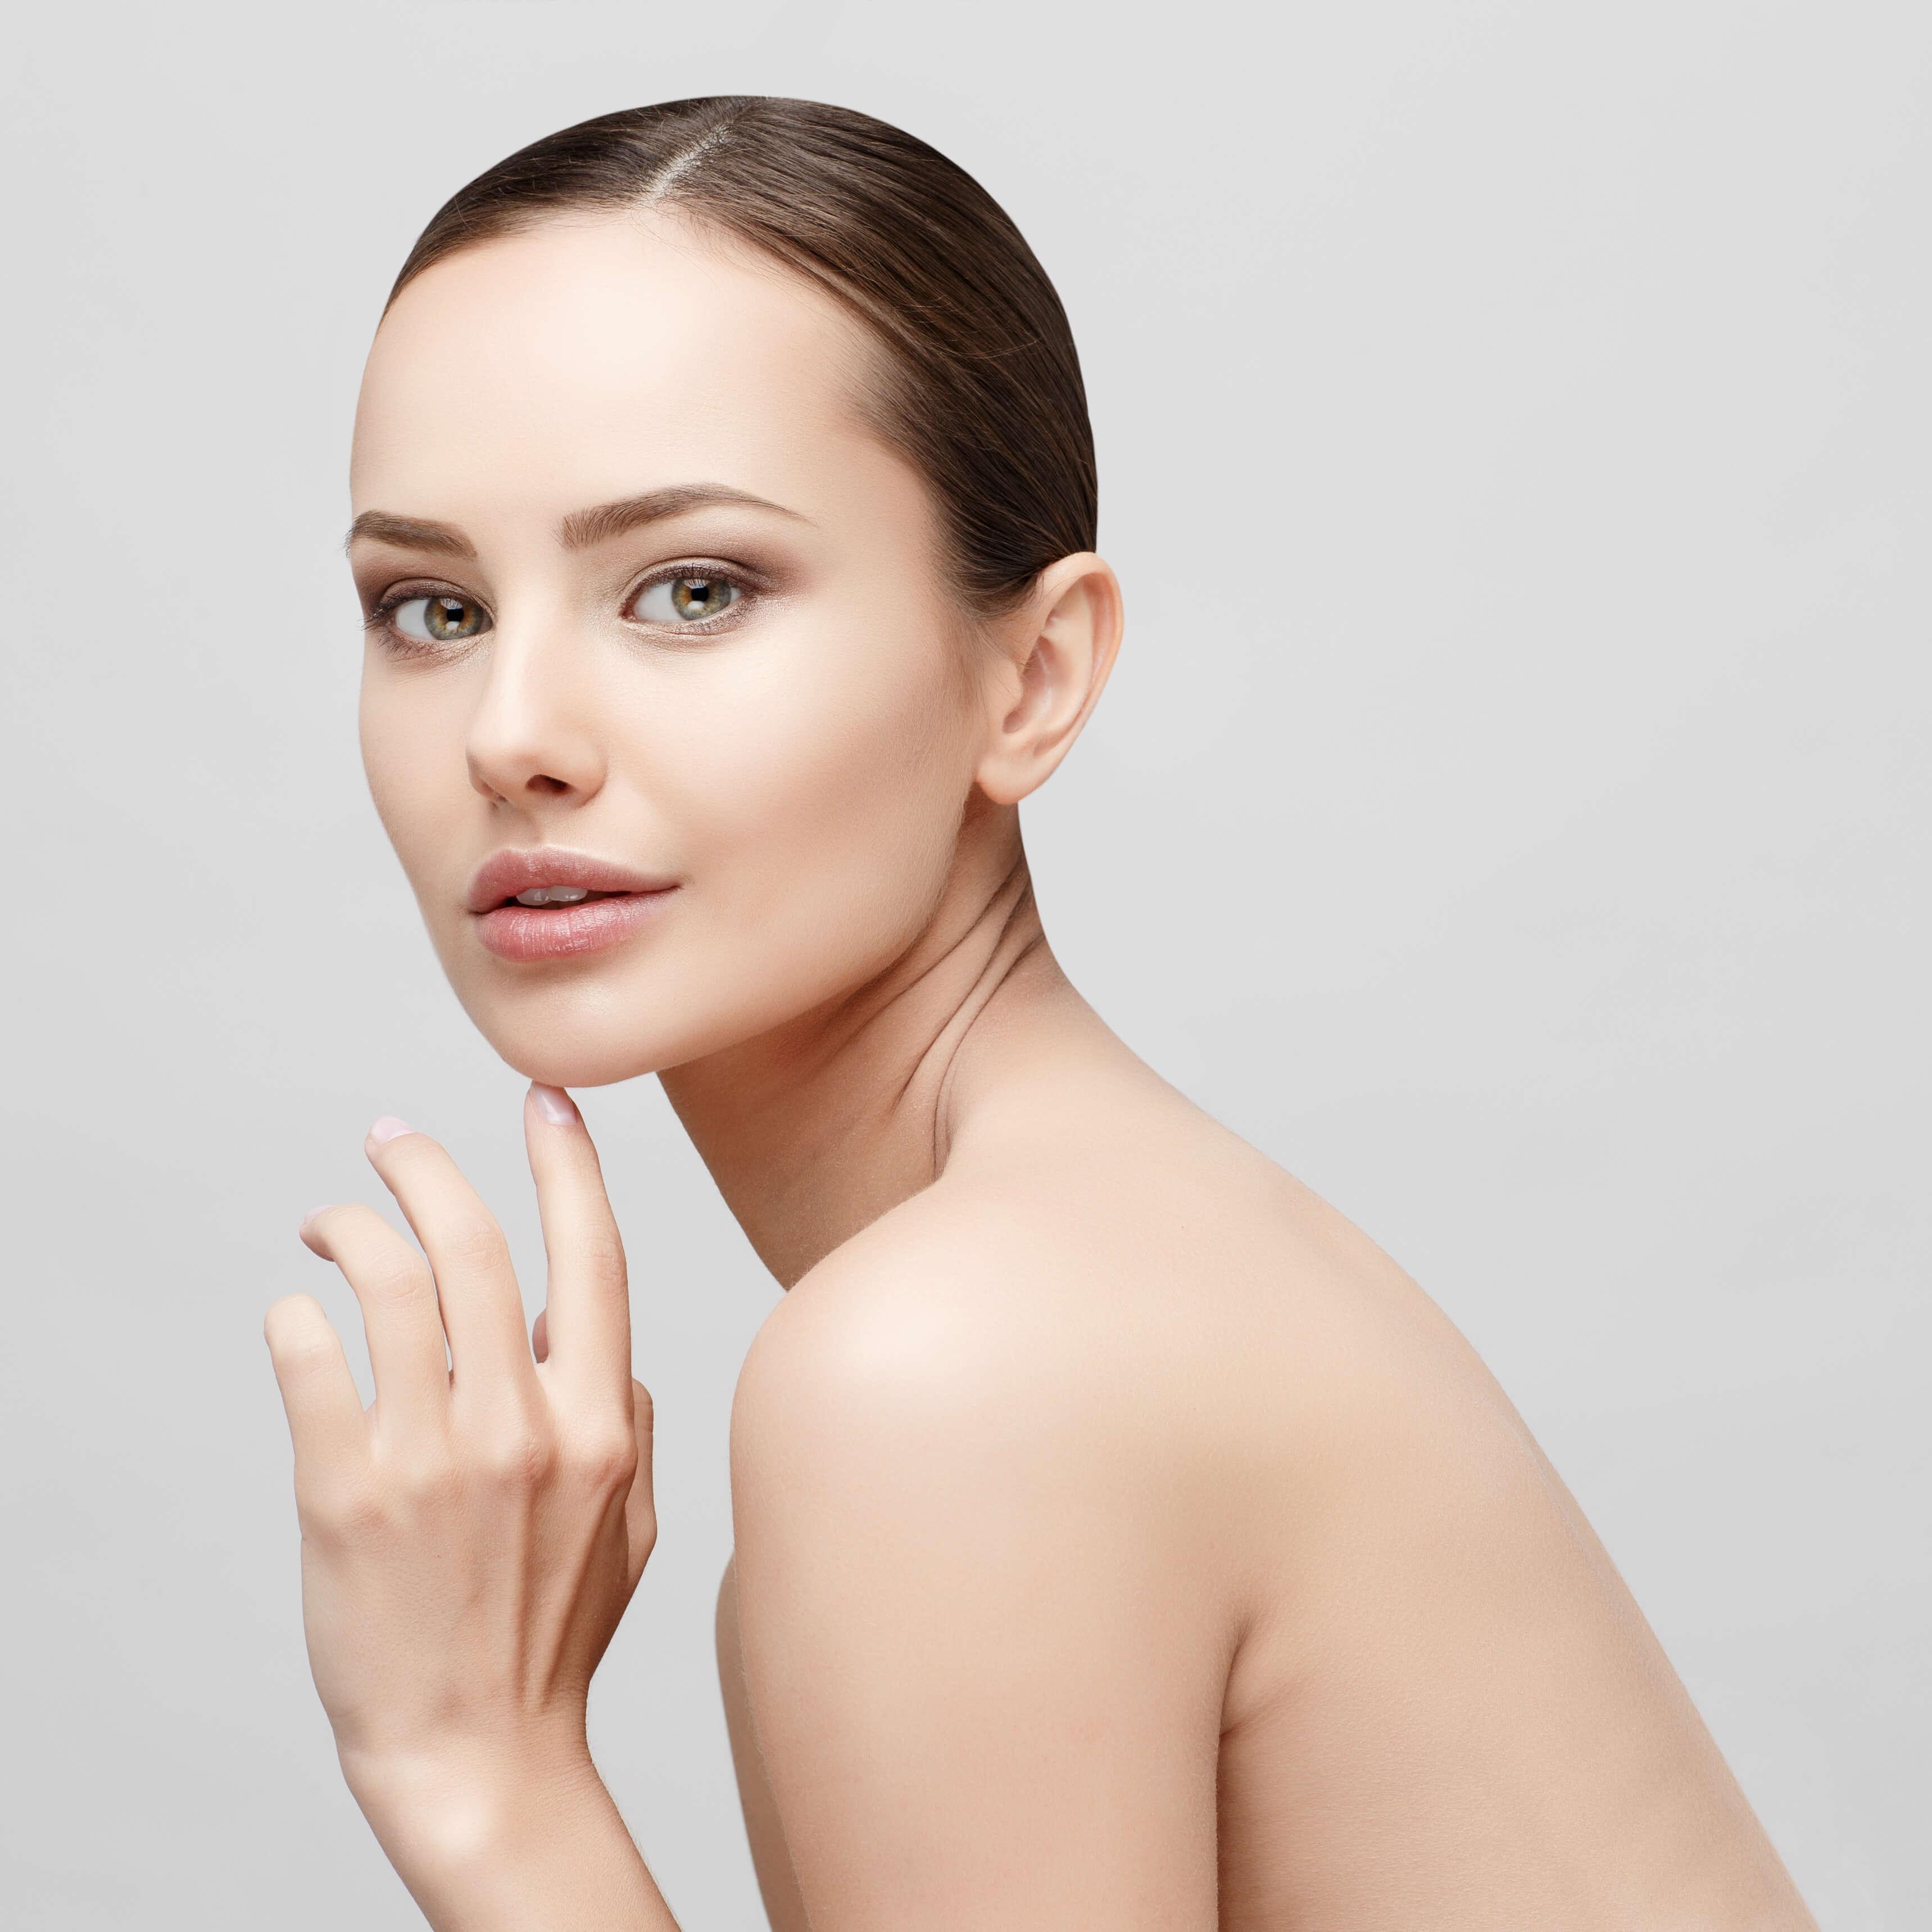 Beautiful Woman With Clean Fresh Skin Apax Medical